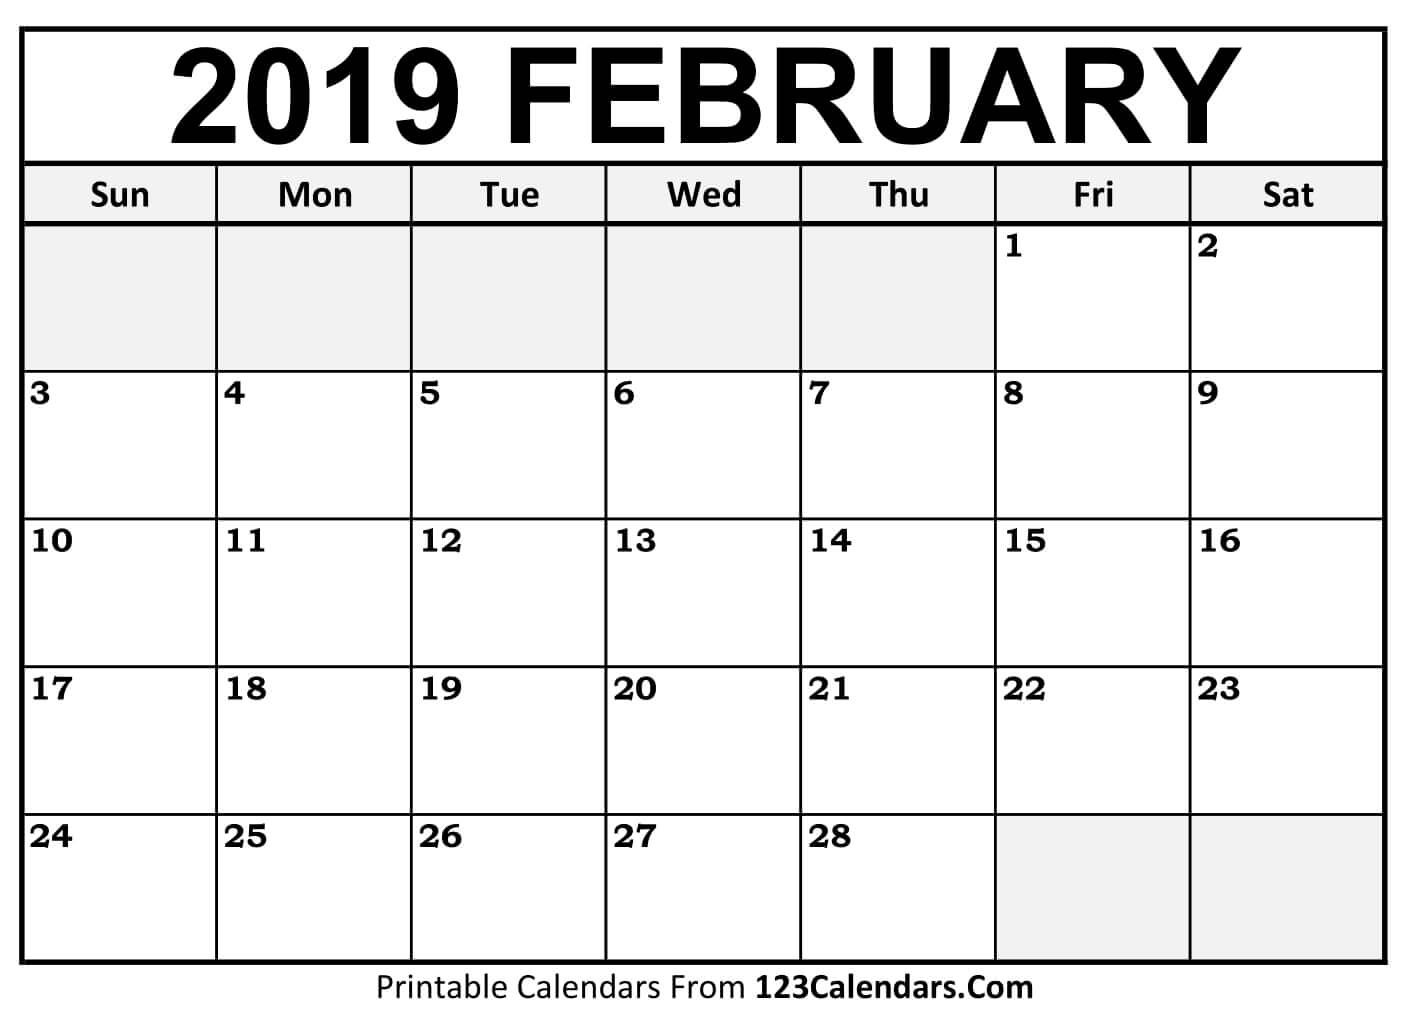 Free Printable Calendars February 2019 Printable February 2019 Calendar Templates 123calendars